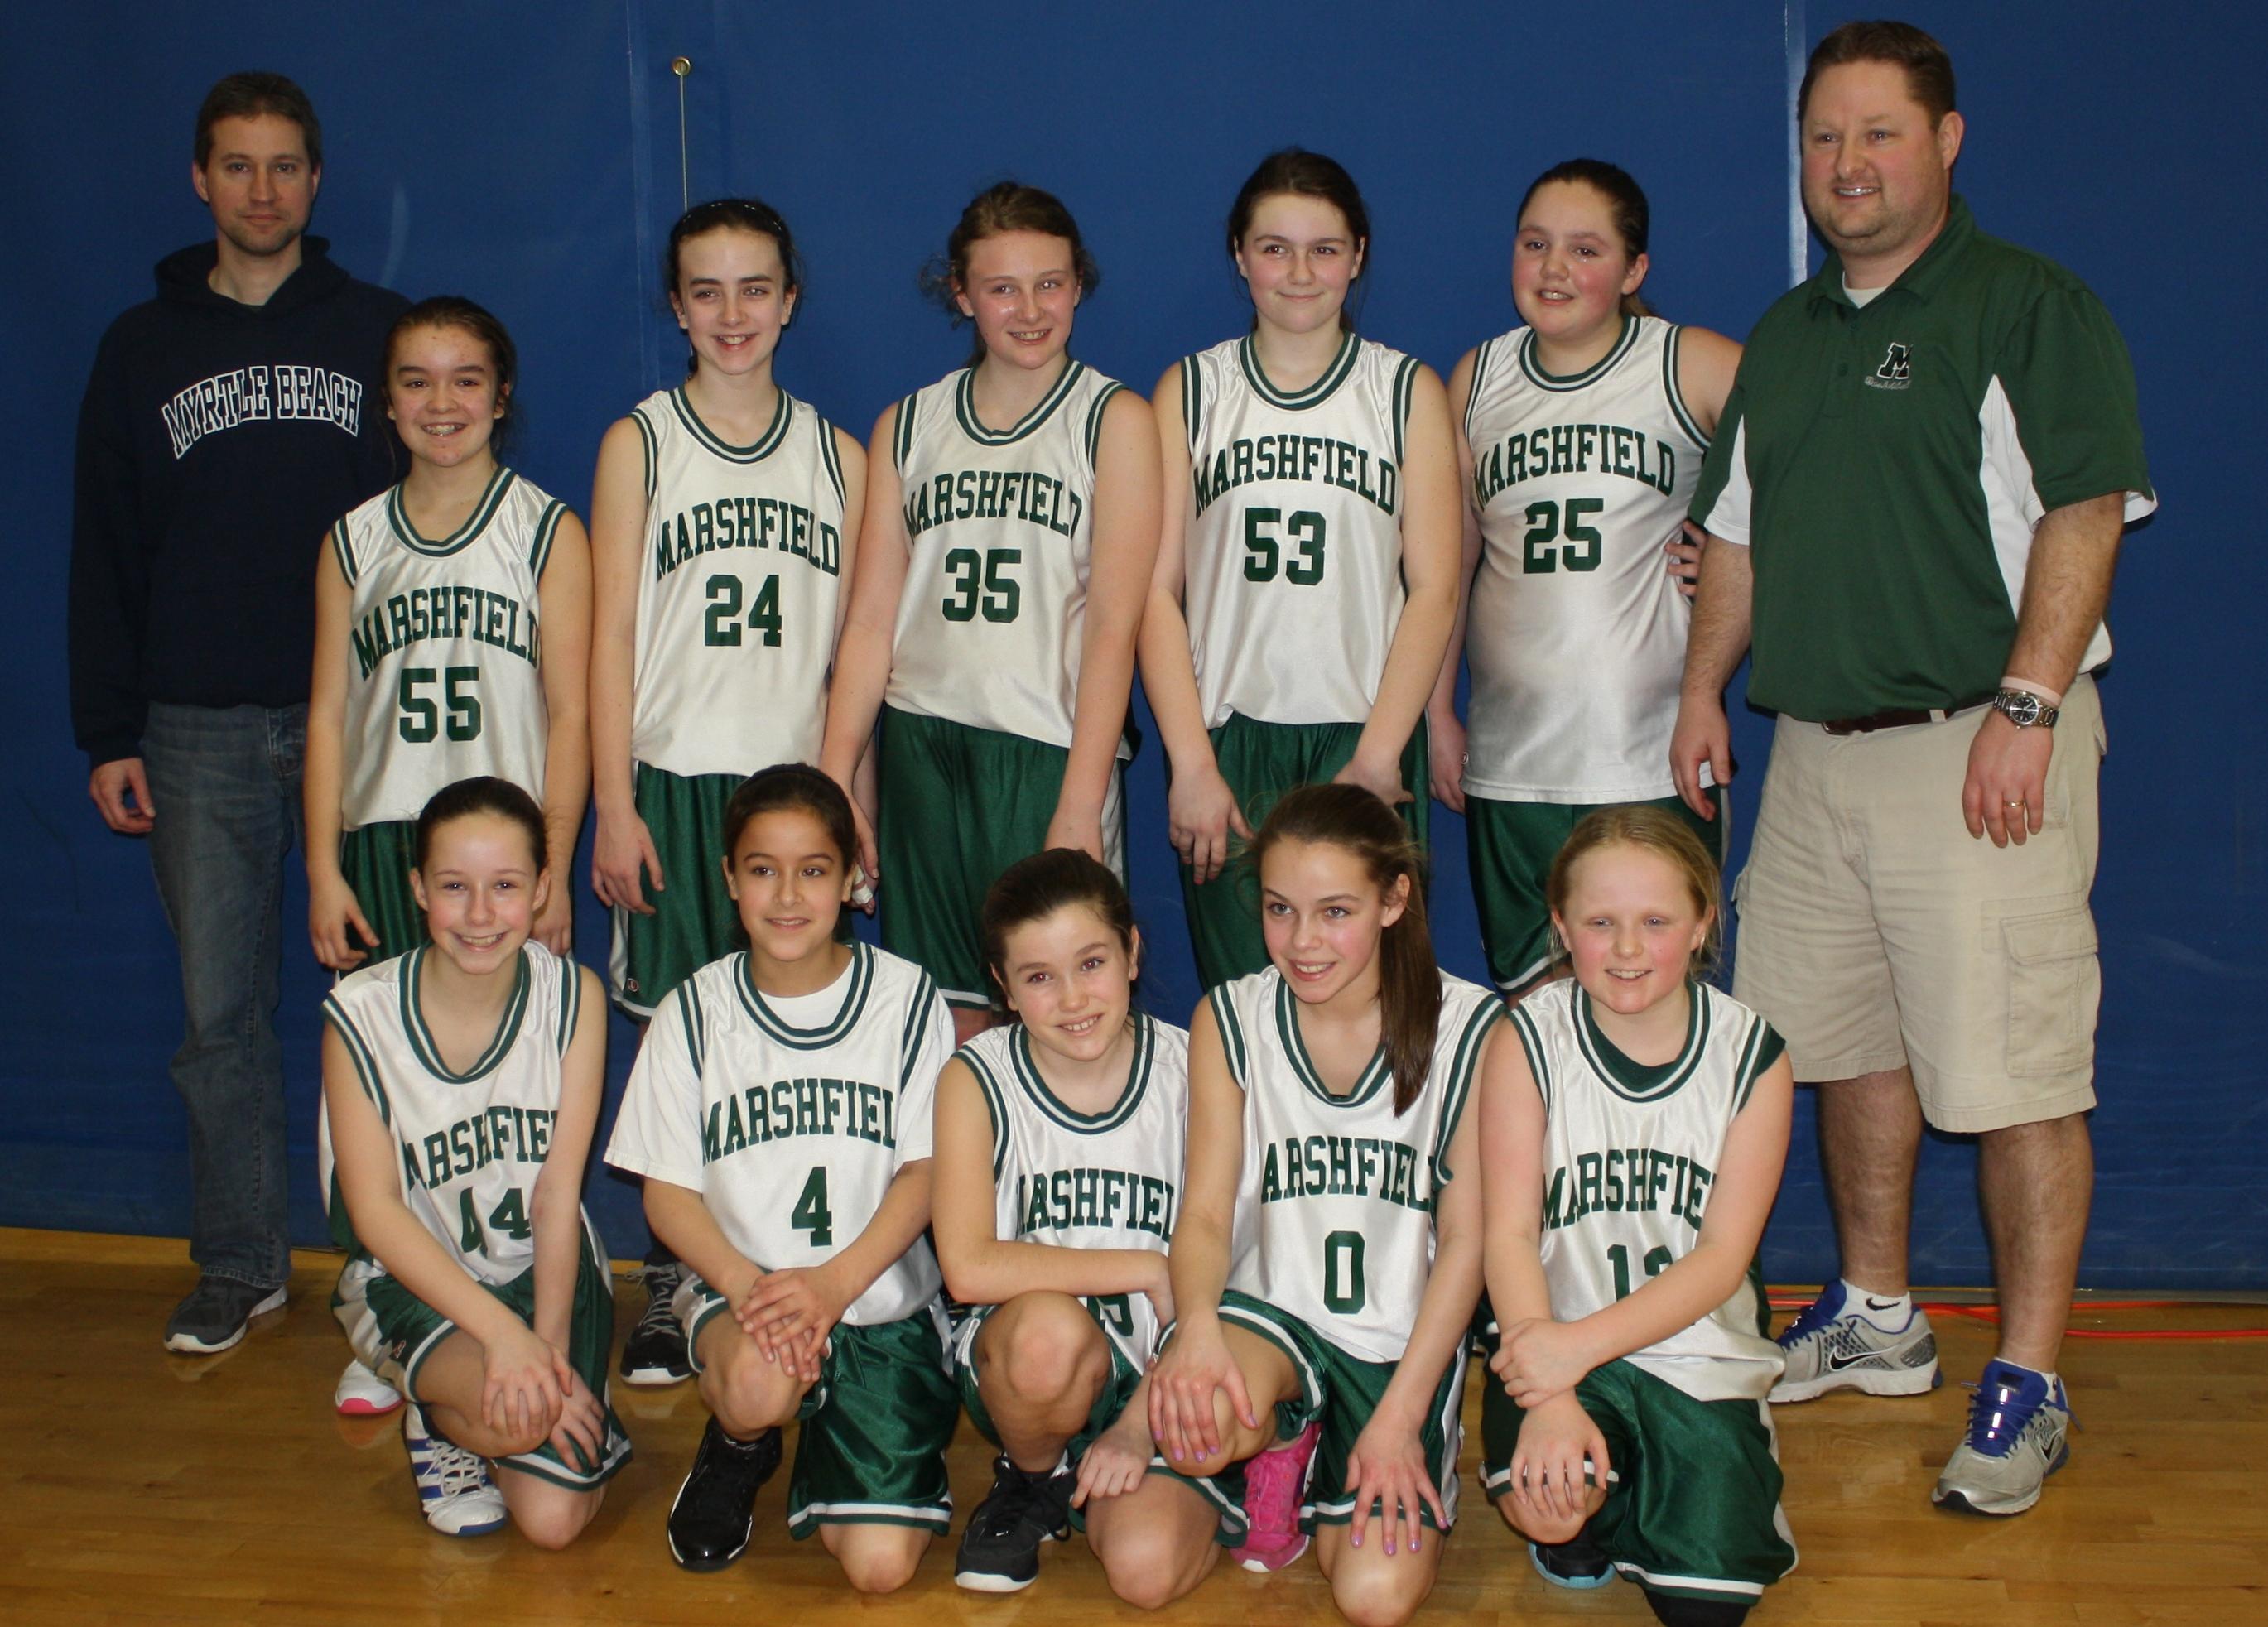 north marshfield girls Knights 1st at marshfield: high school sports stories from rallynorthnet.